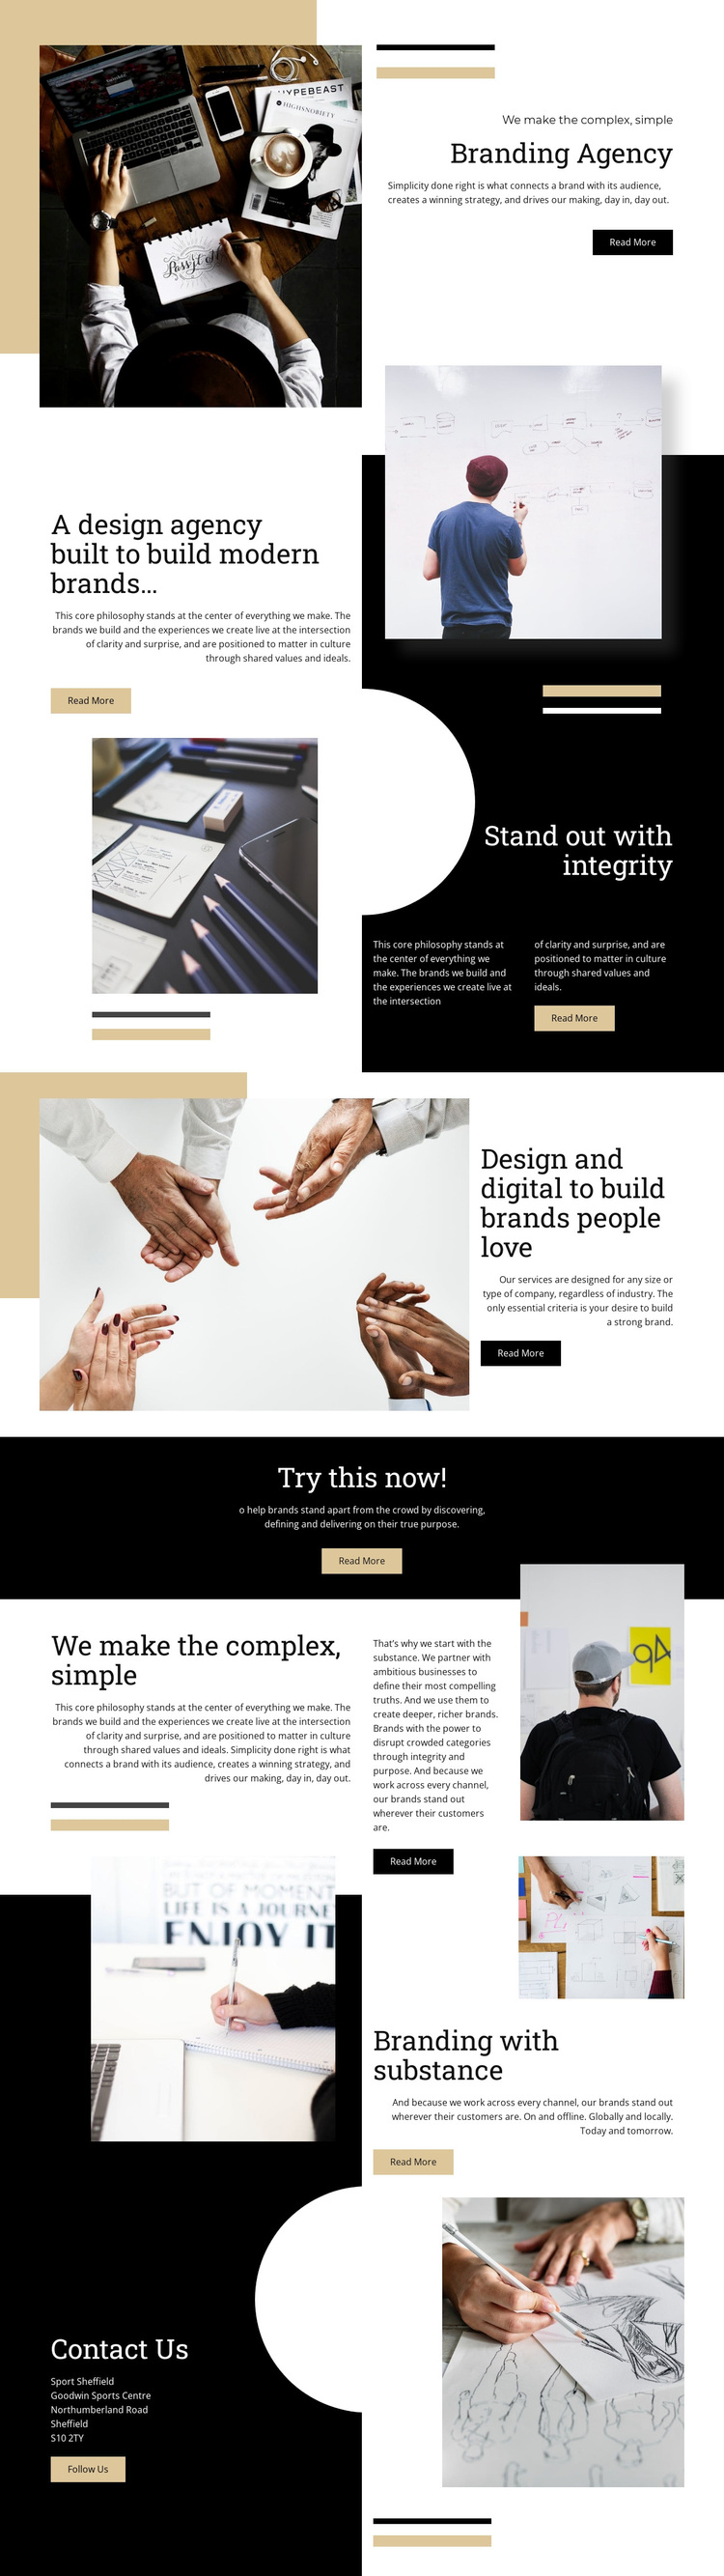 Branding Agency Template